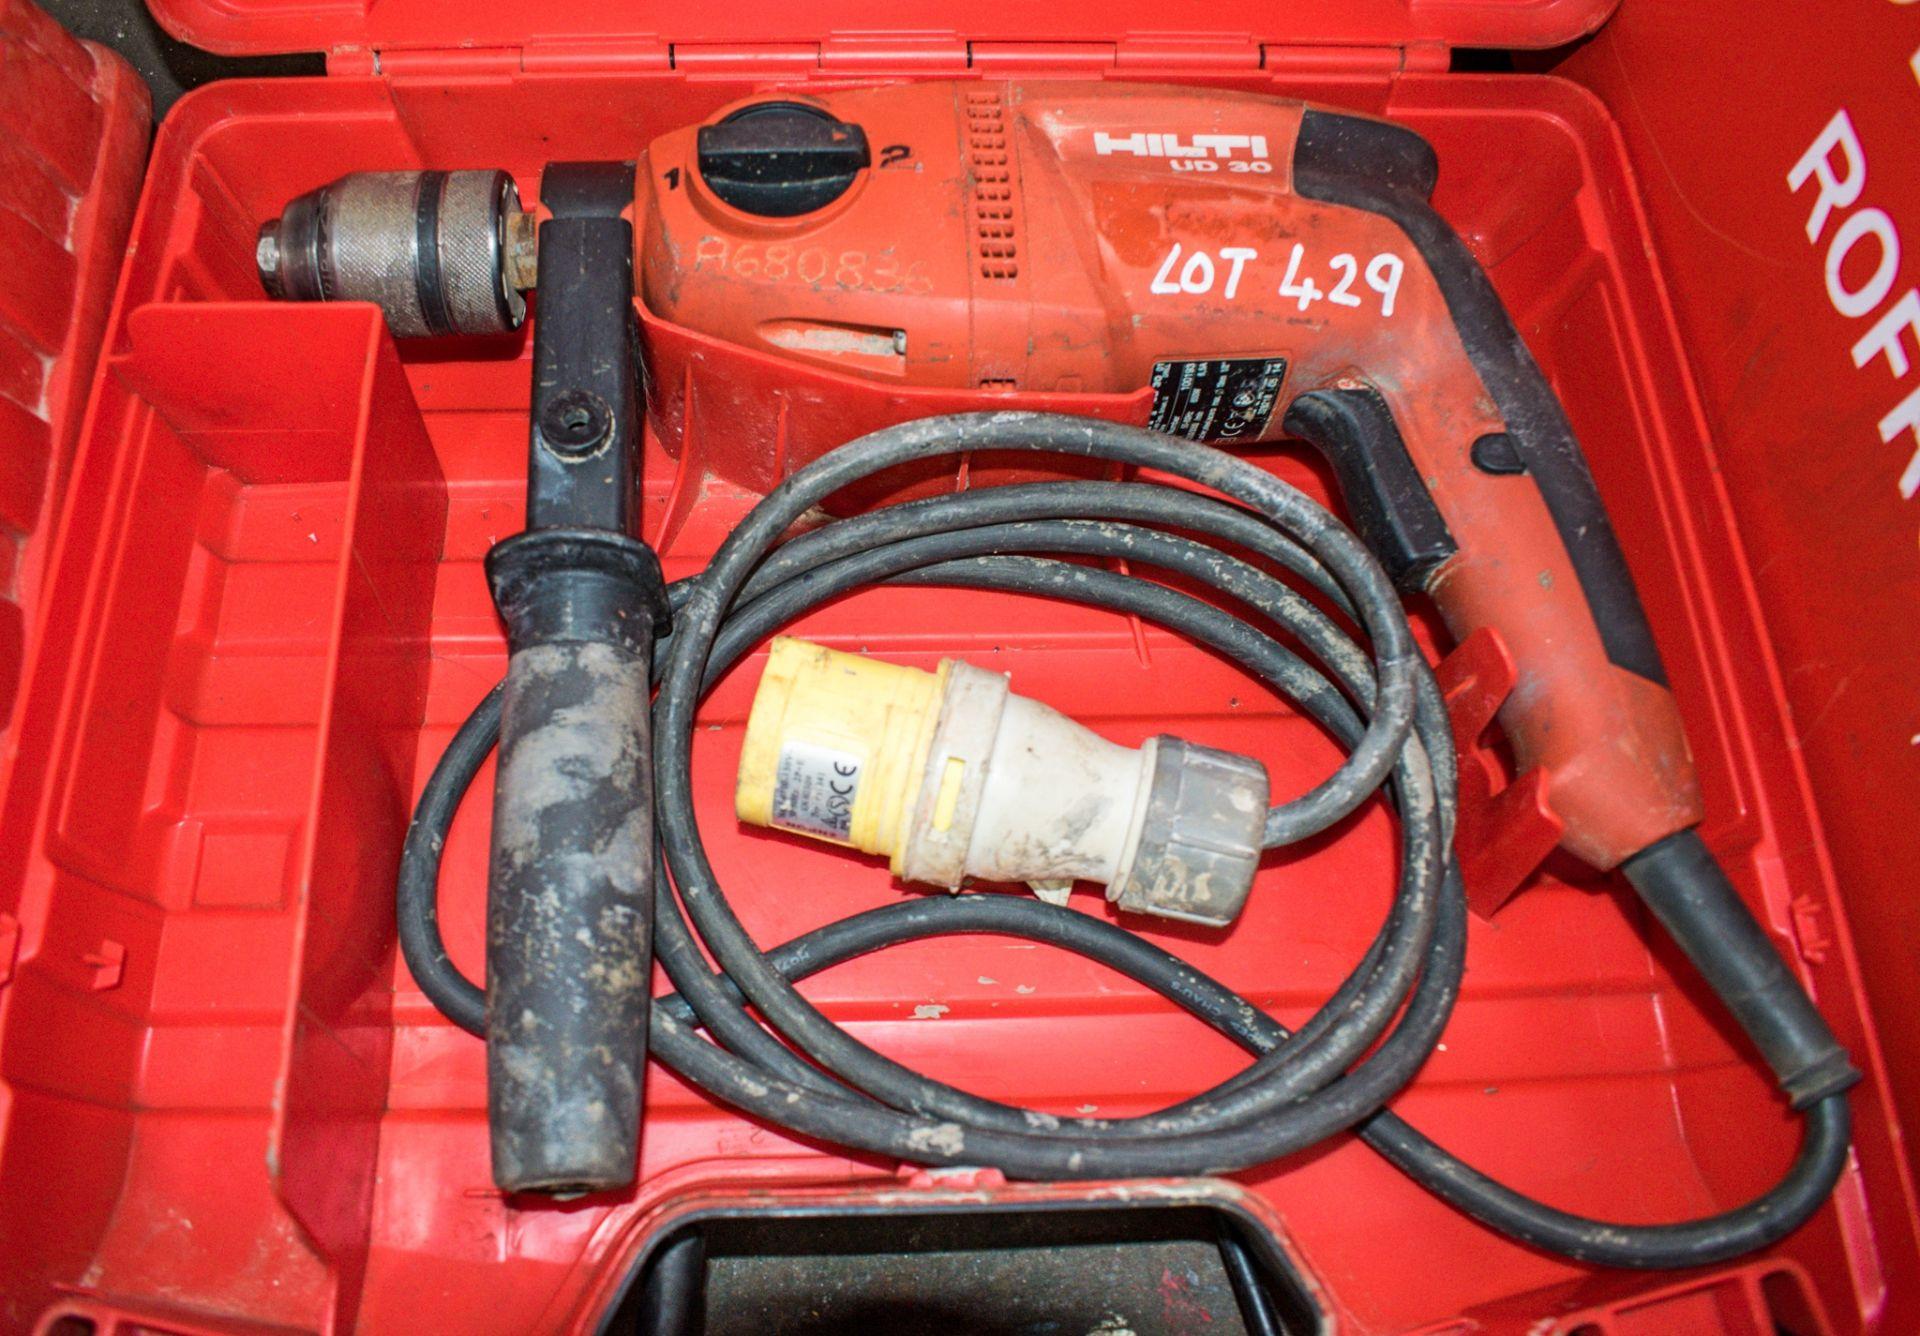 Lot 429 - Hilti VD-30 110v hammer drill c/w carry case